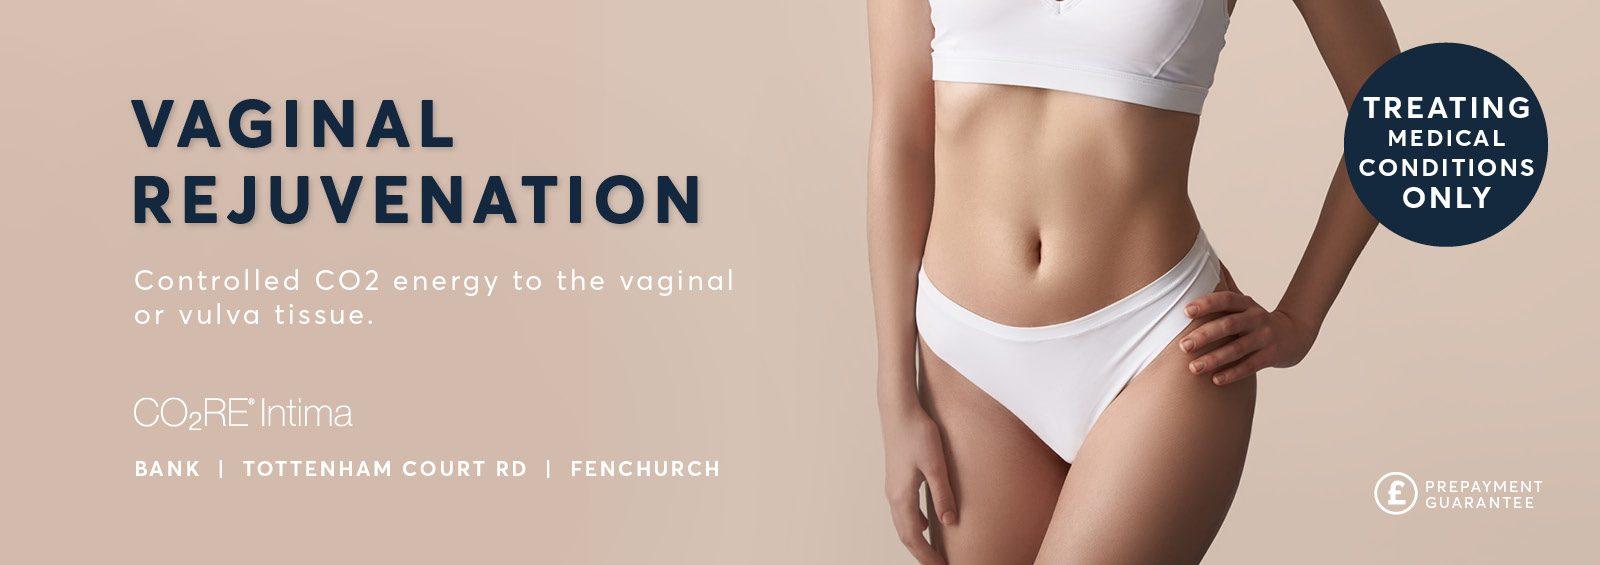 Vaginal Rejuvenation London, C02